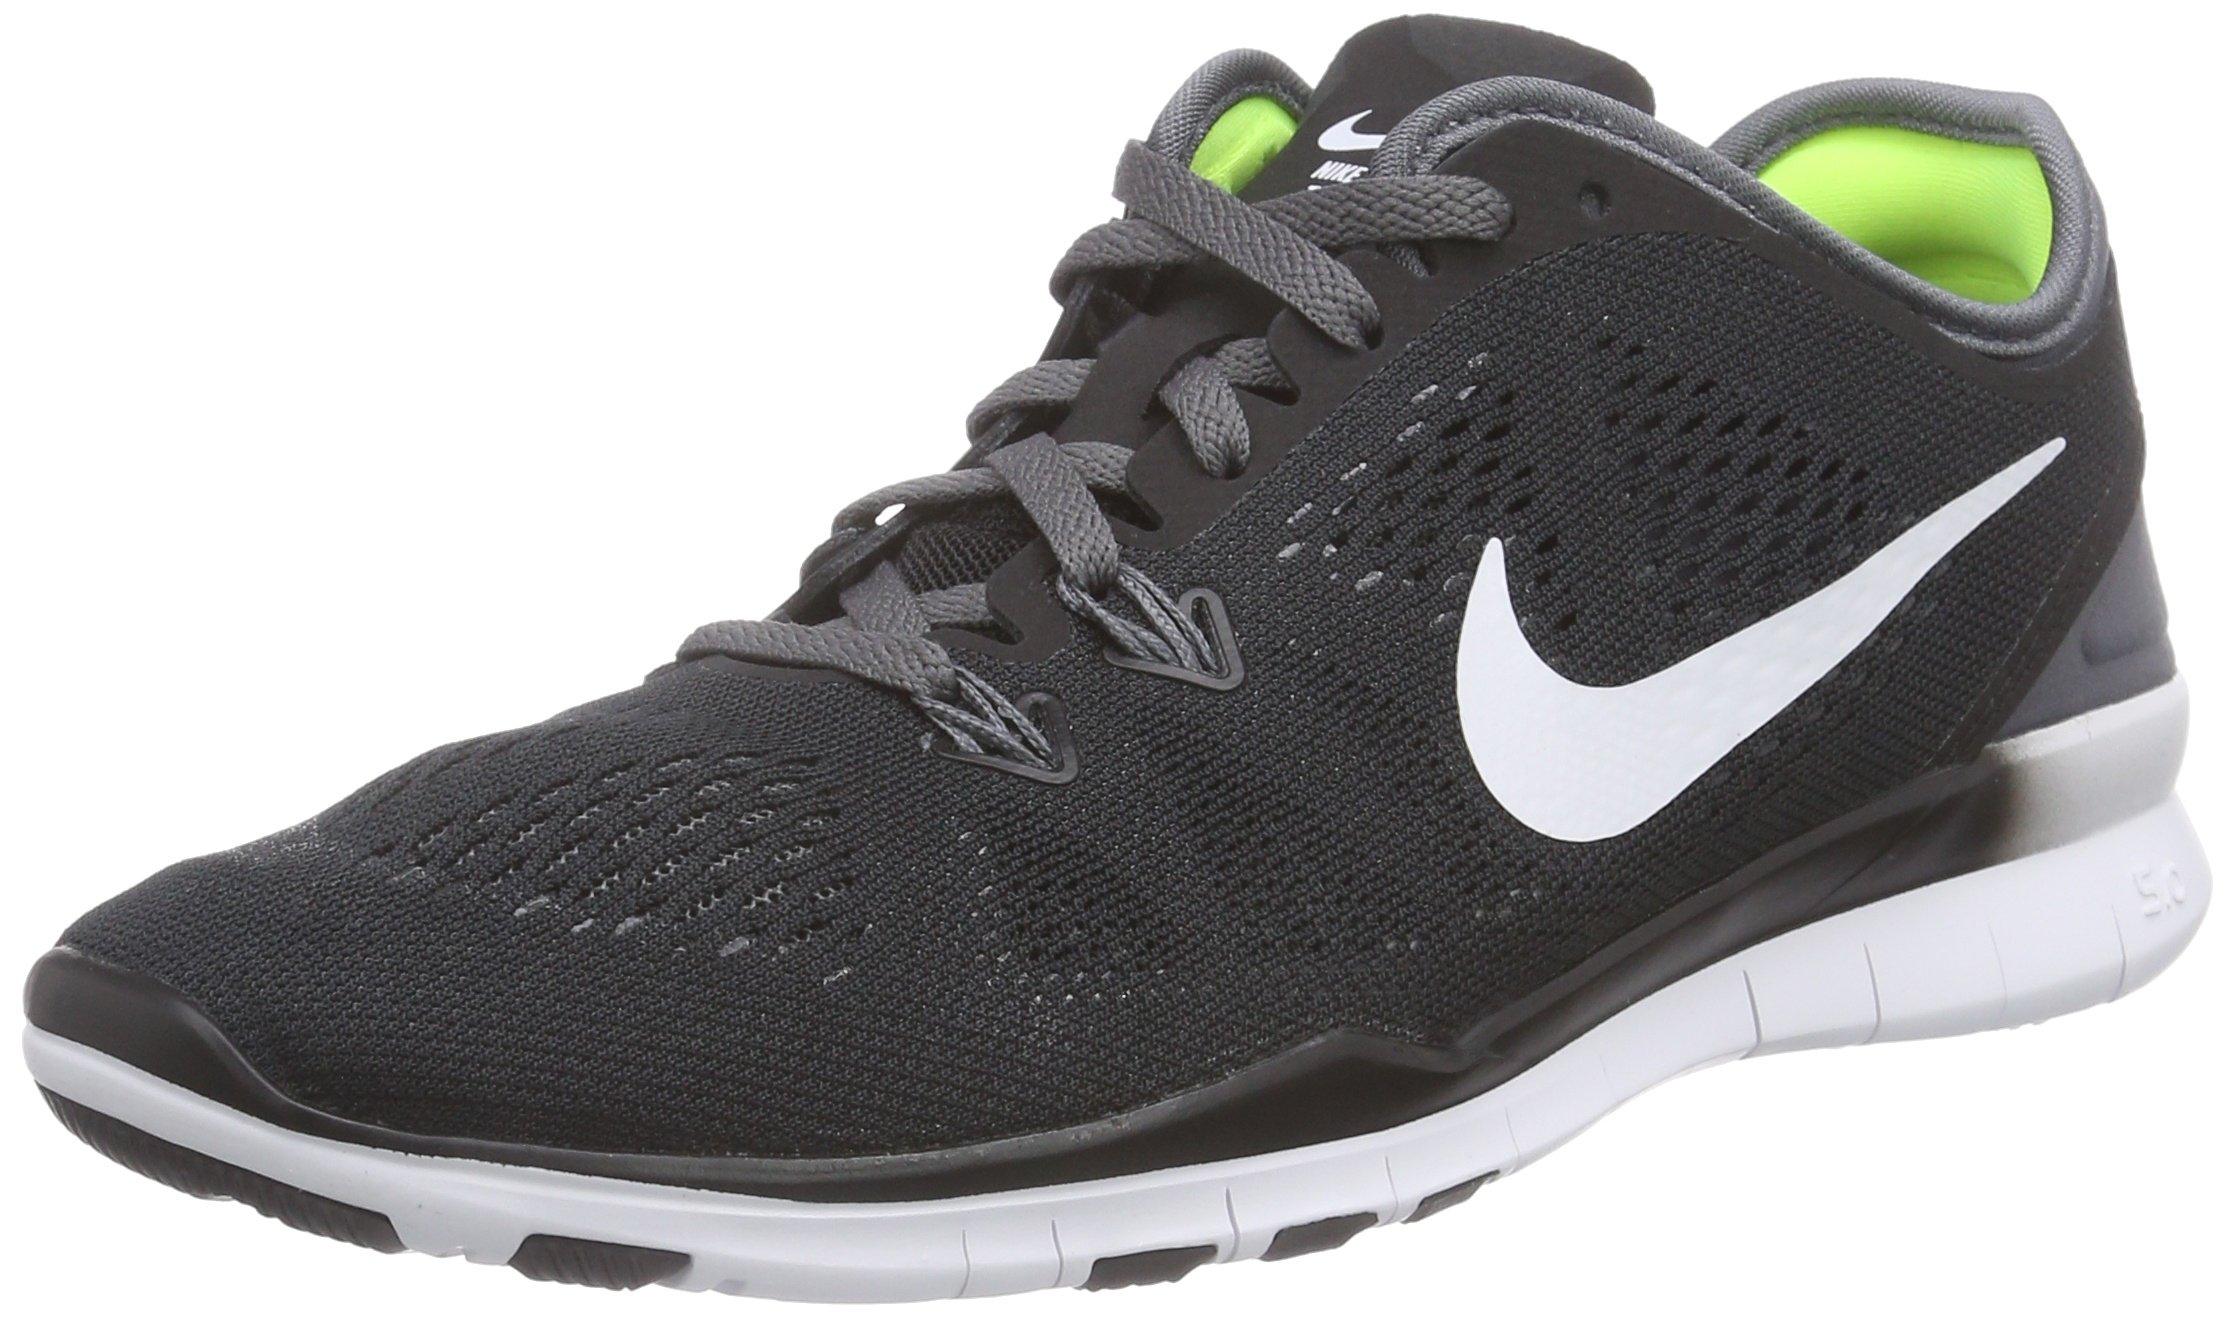 Nike Womens Free 5.0 Tr Fit 5 Black/White/Dark Grey/White Training Shoe 5 Women US